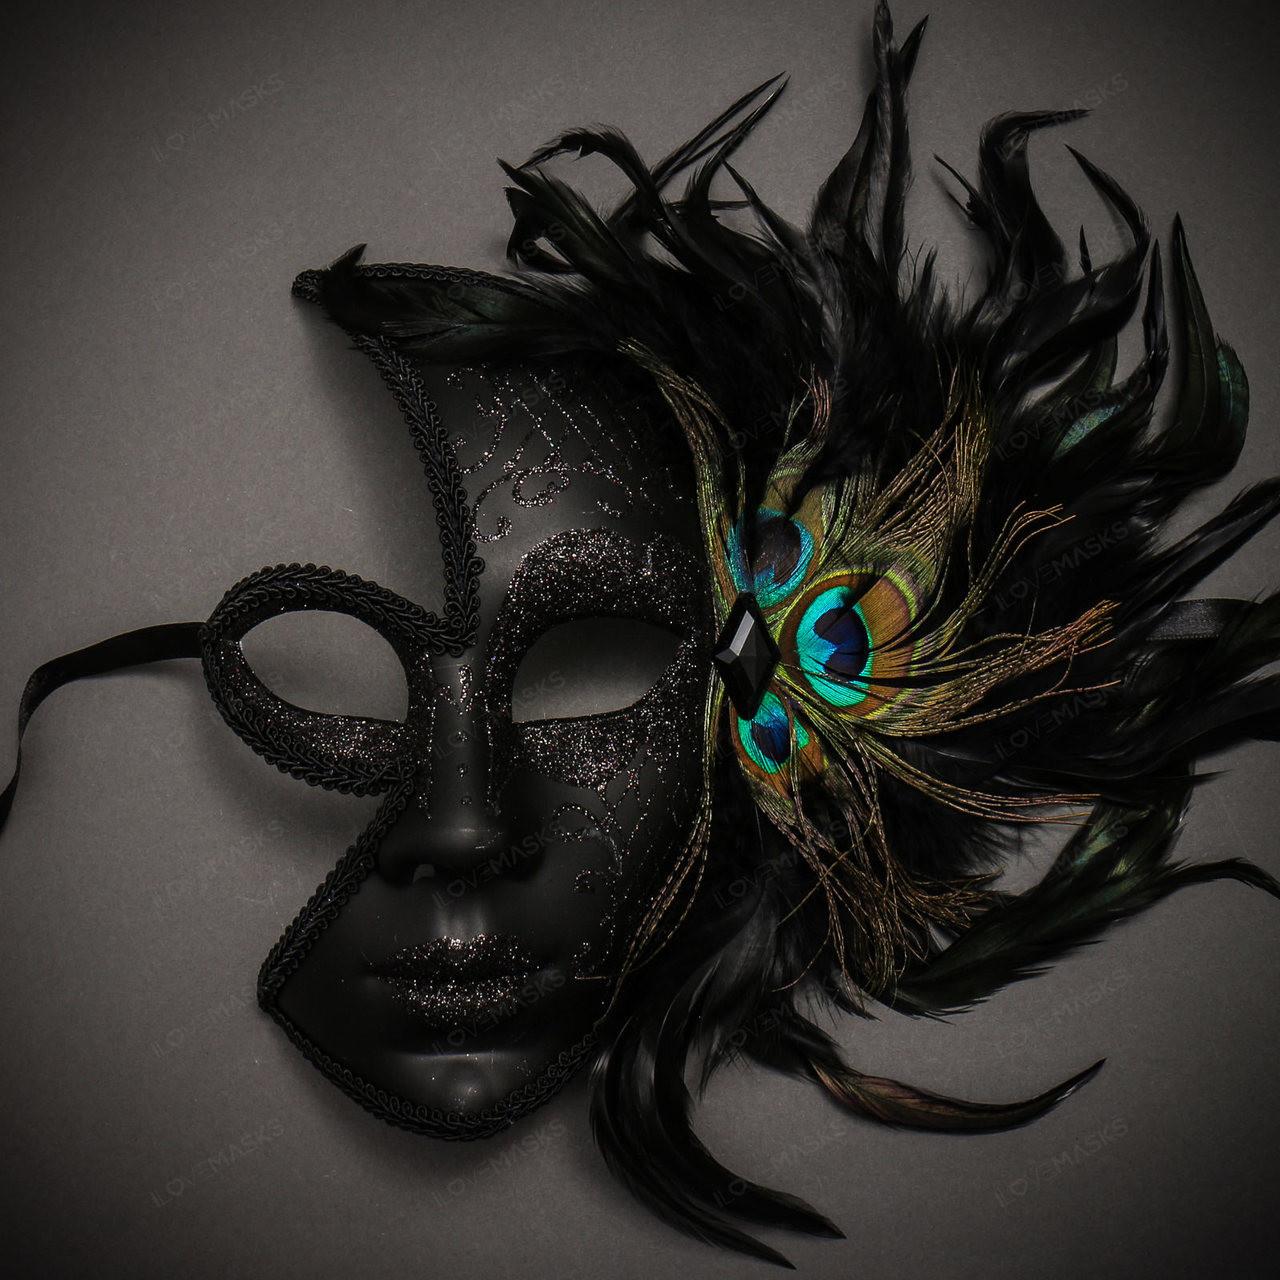 Womens Peacock Feather Full Half-Eye Venetian Mard Gras Masquerade Mask